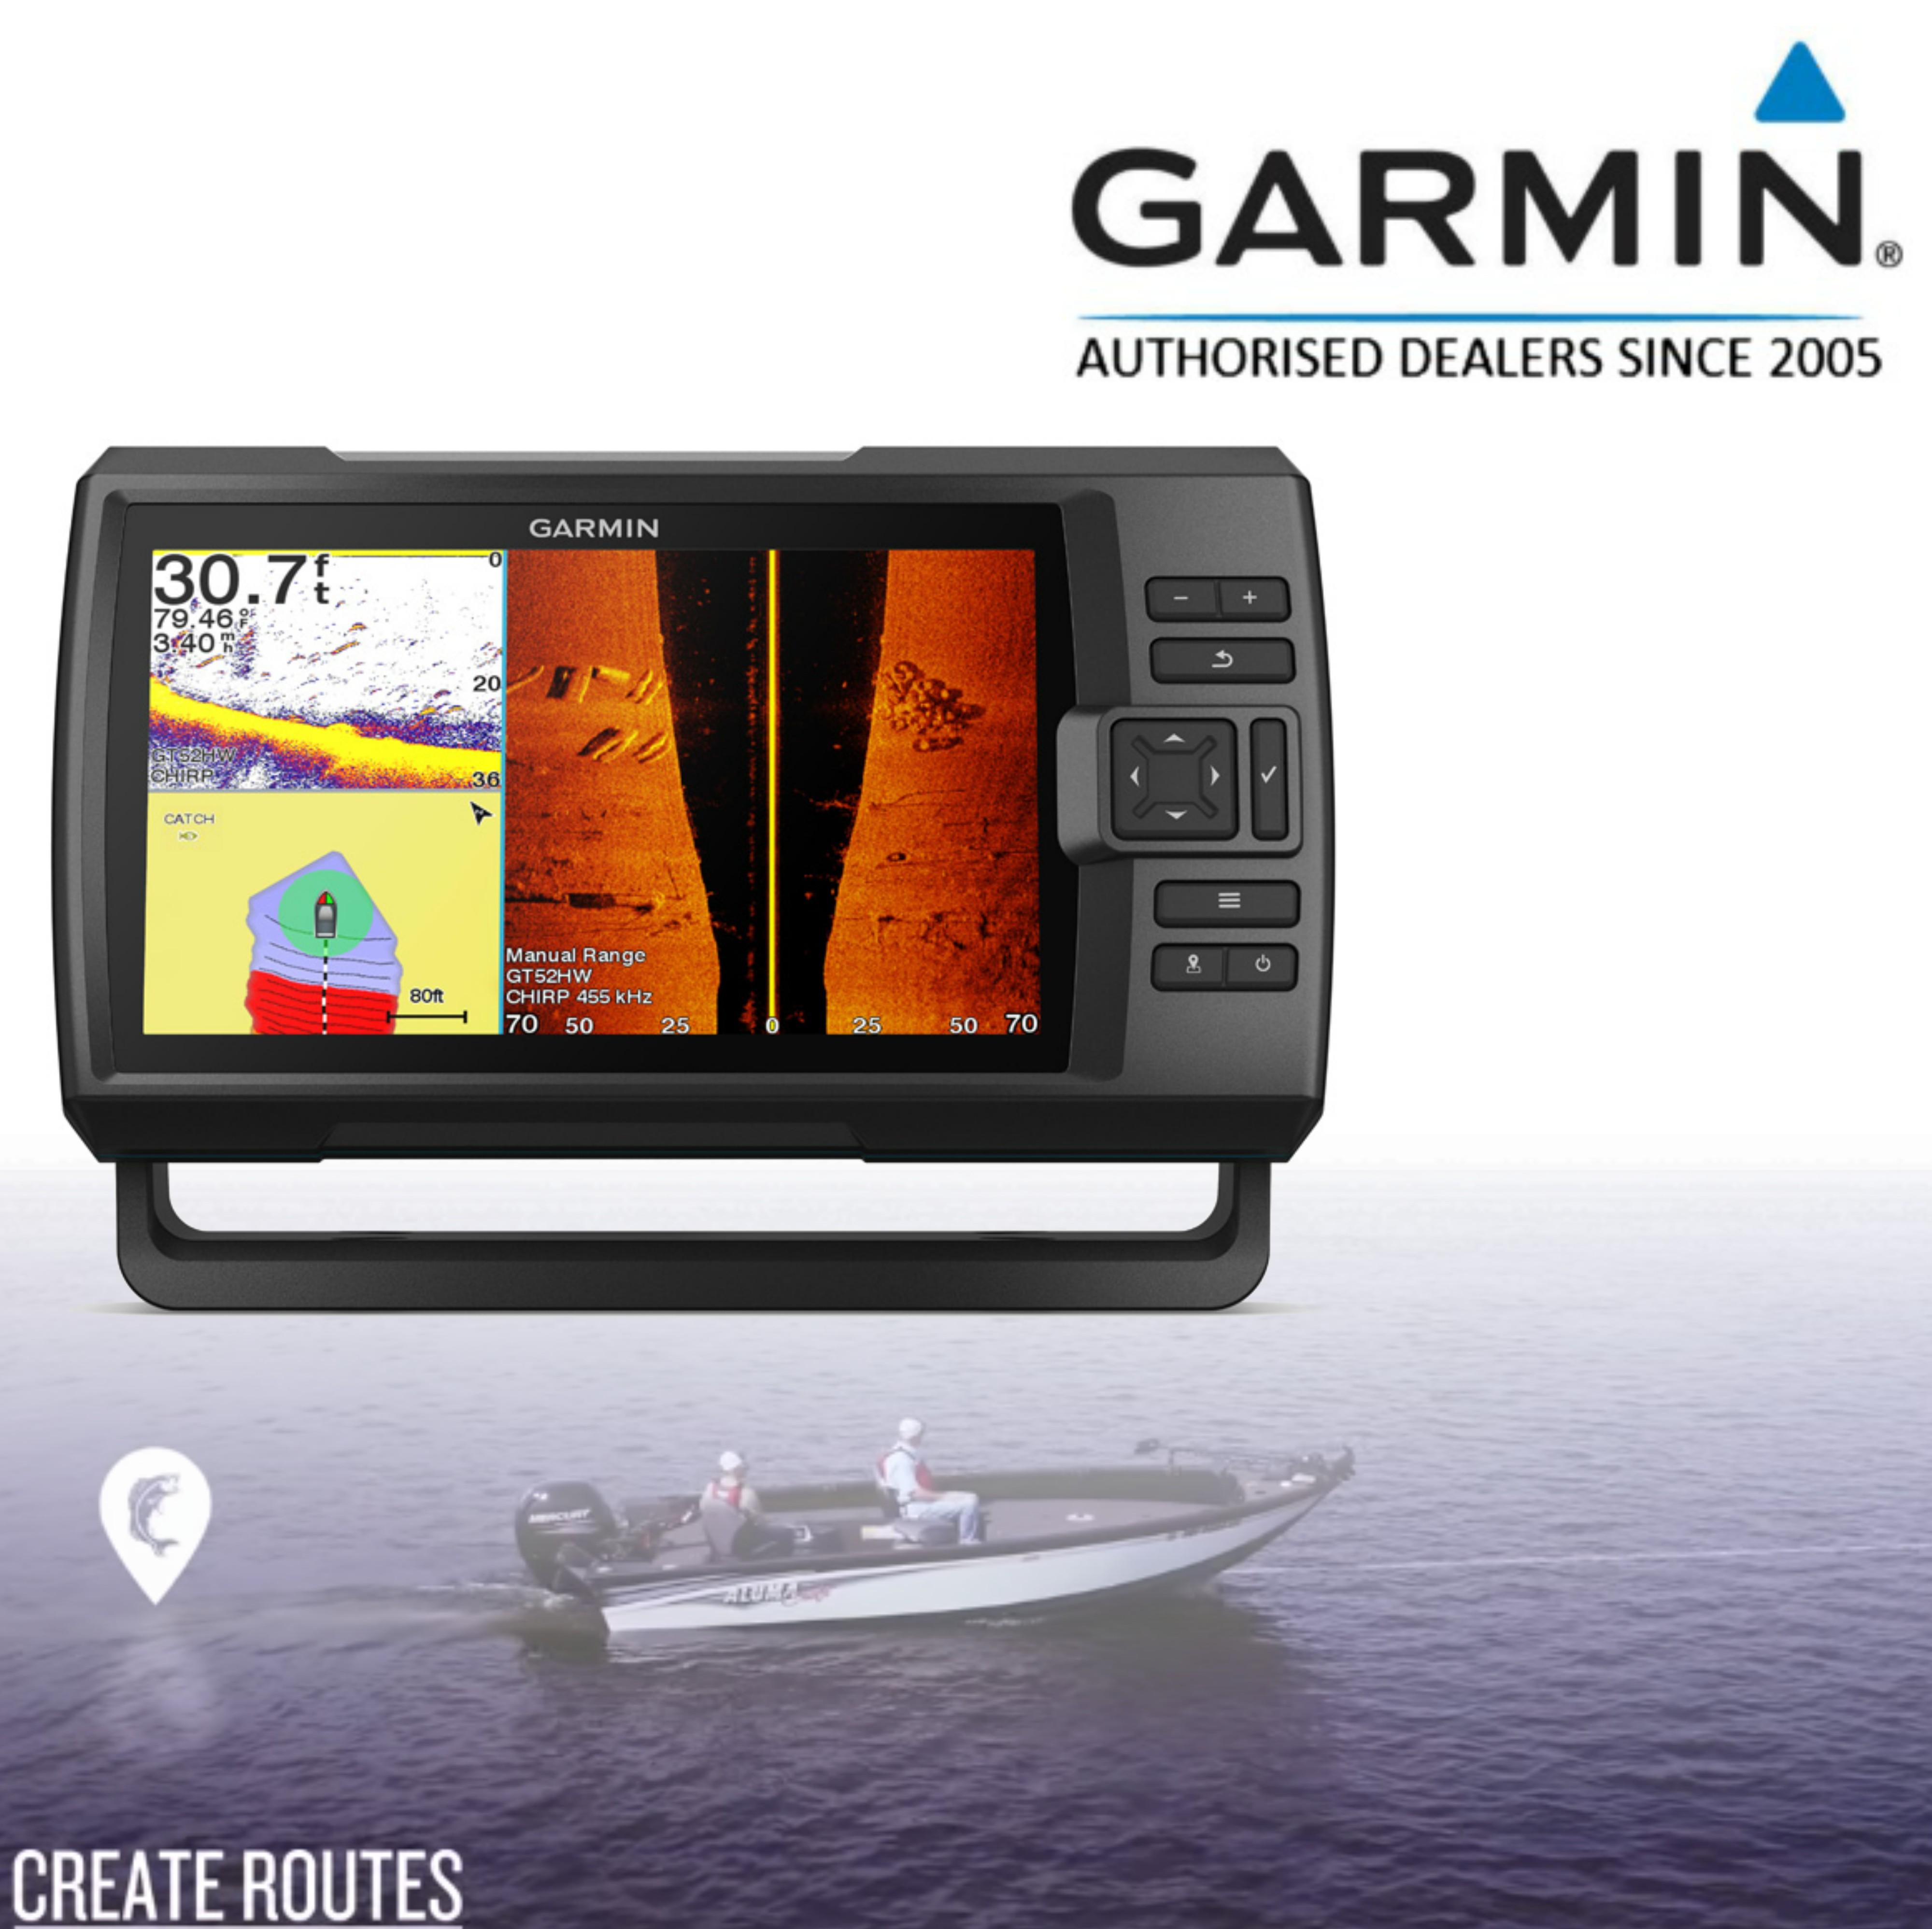 Garmin STRIKER Plus 9sv|IPX7|GPS|Fish Finder|Active Captain|Transducer|In Marine